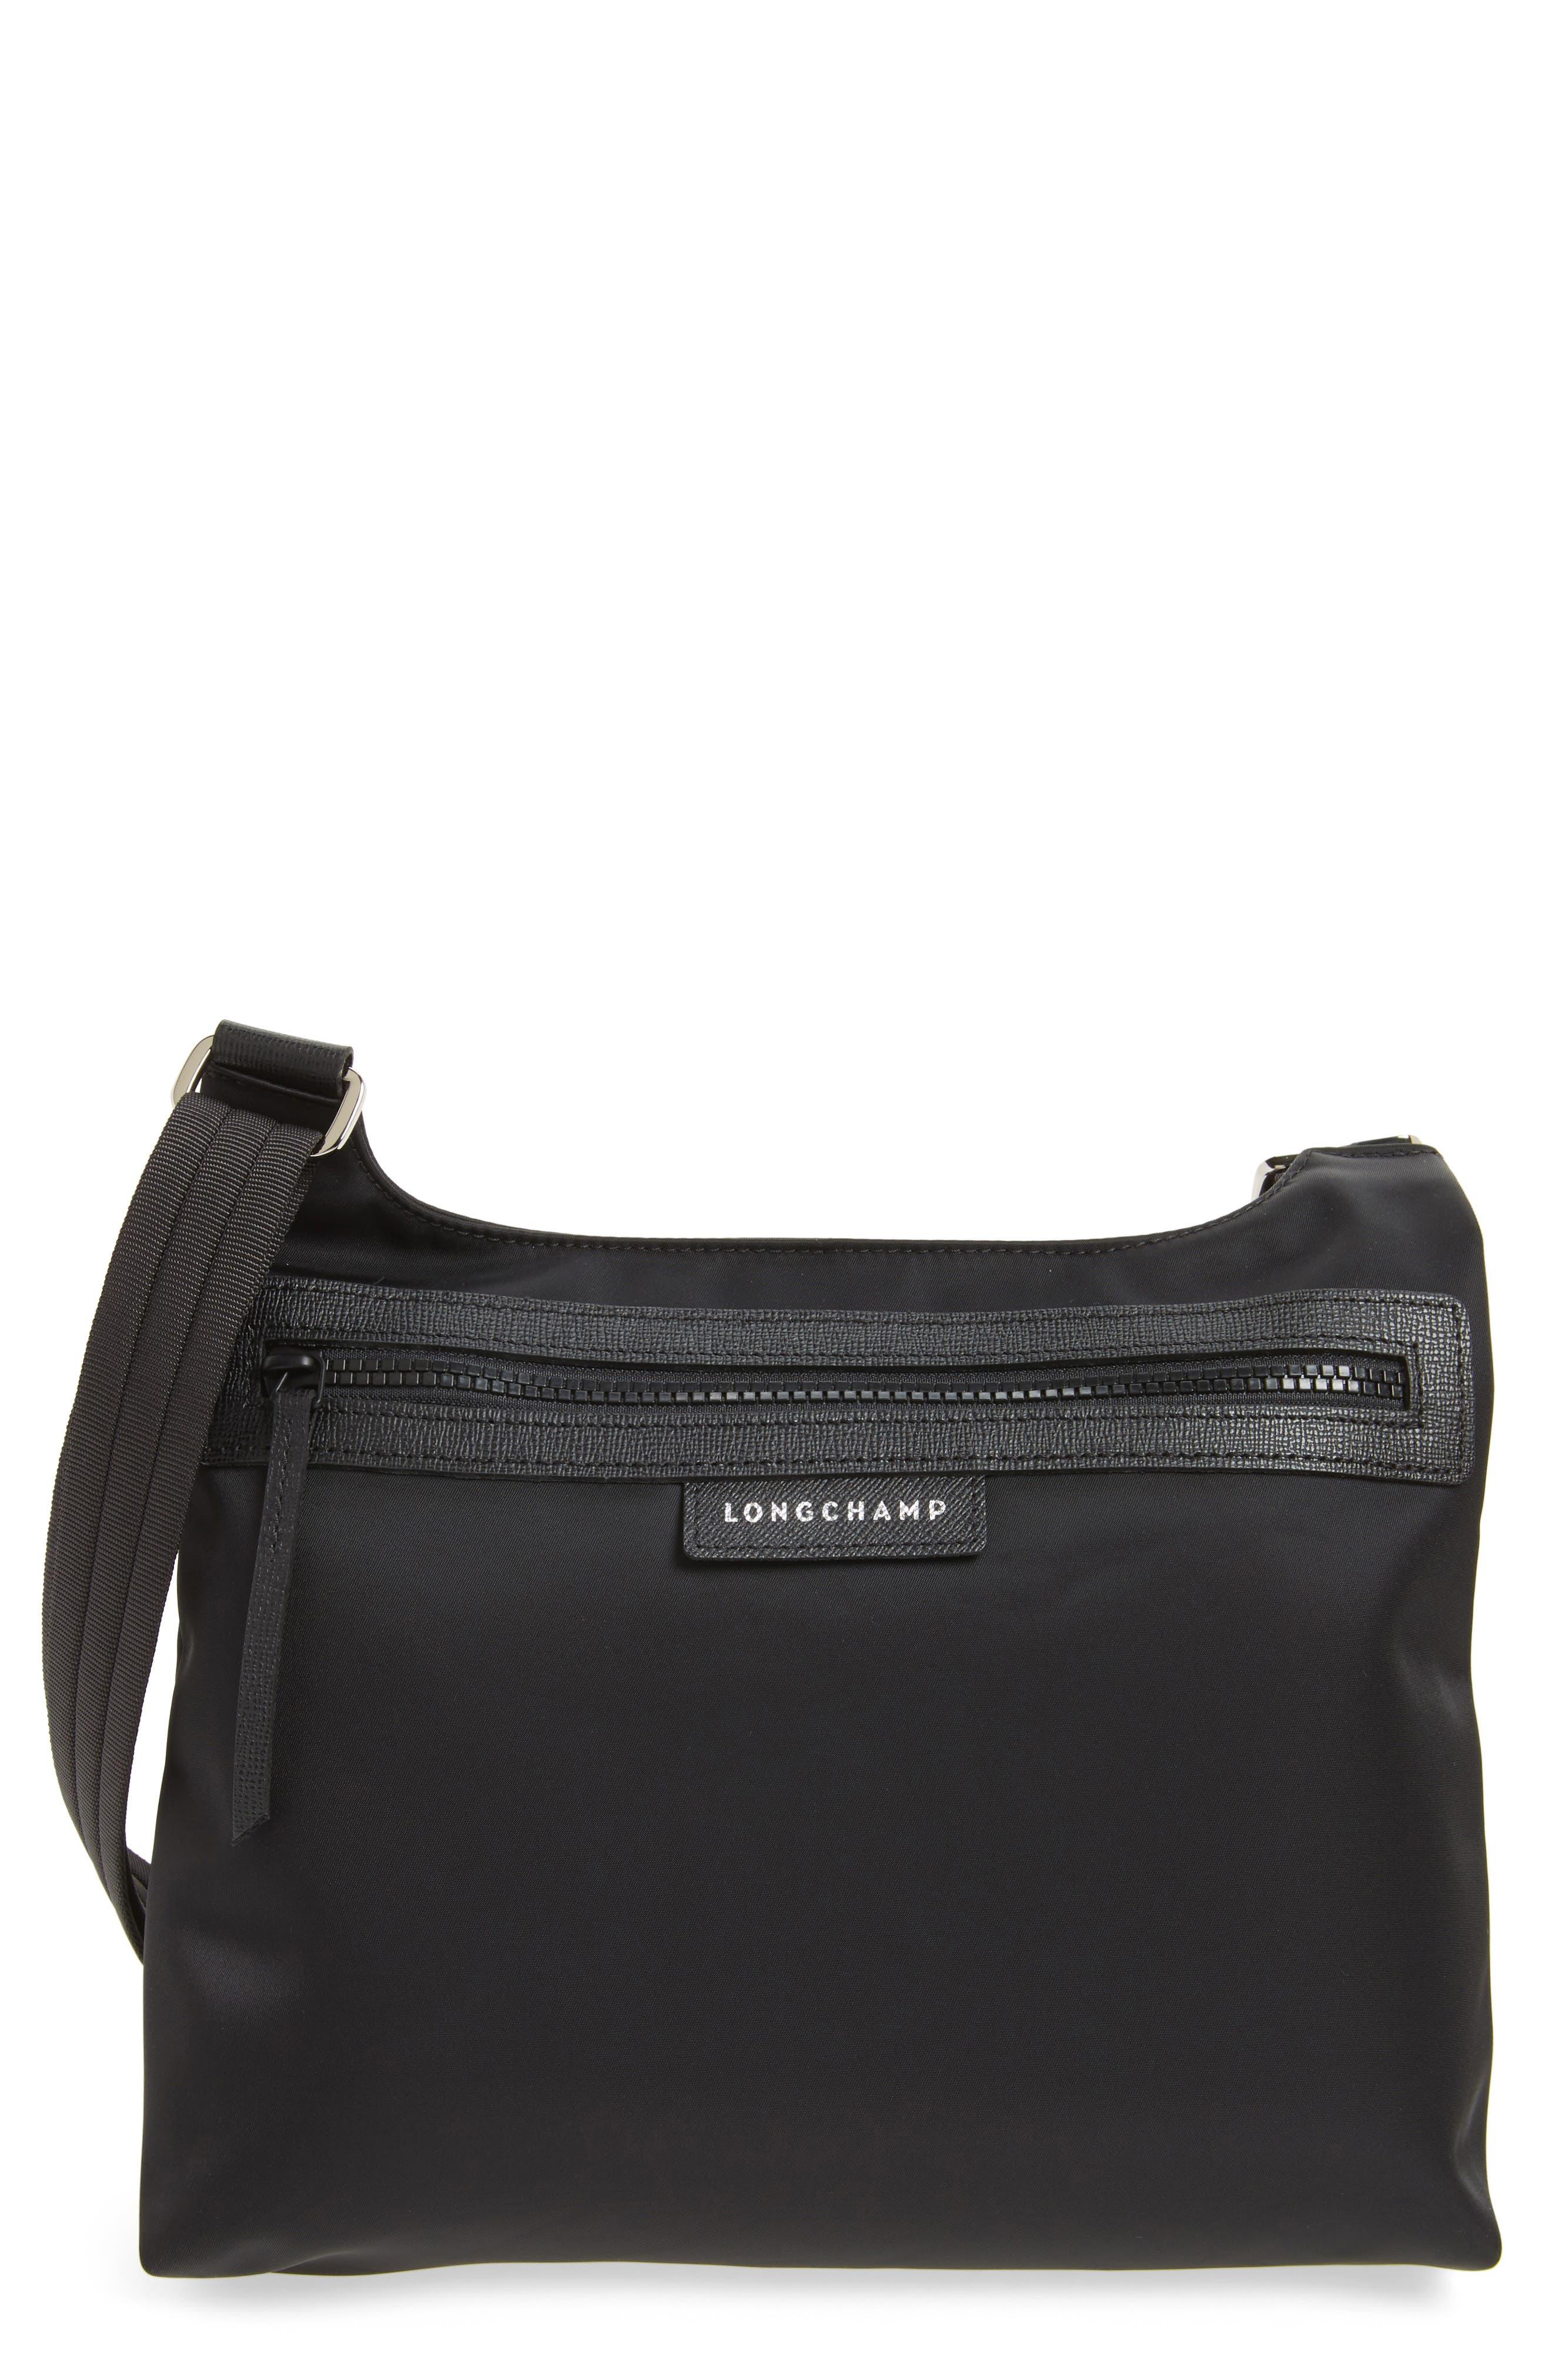 'Le Pliage Neo' Nylon Crossbody Bag,                             Alternate thumbnail 2, color,                             BLACK